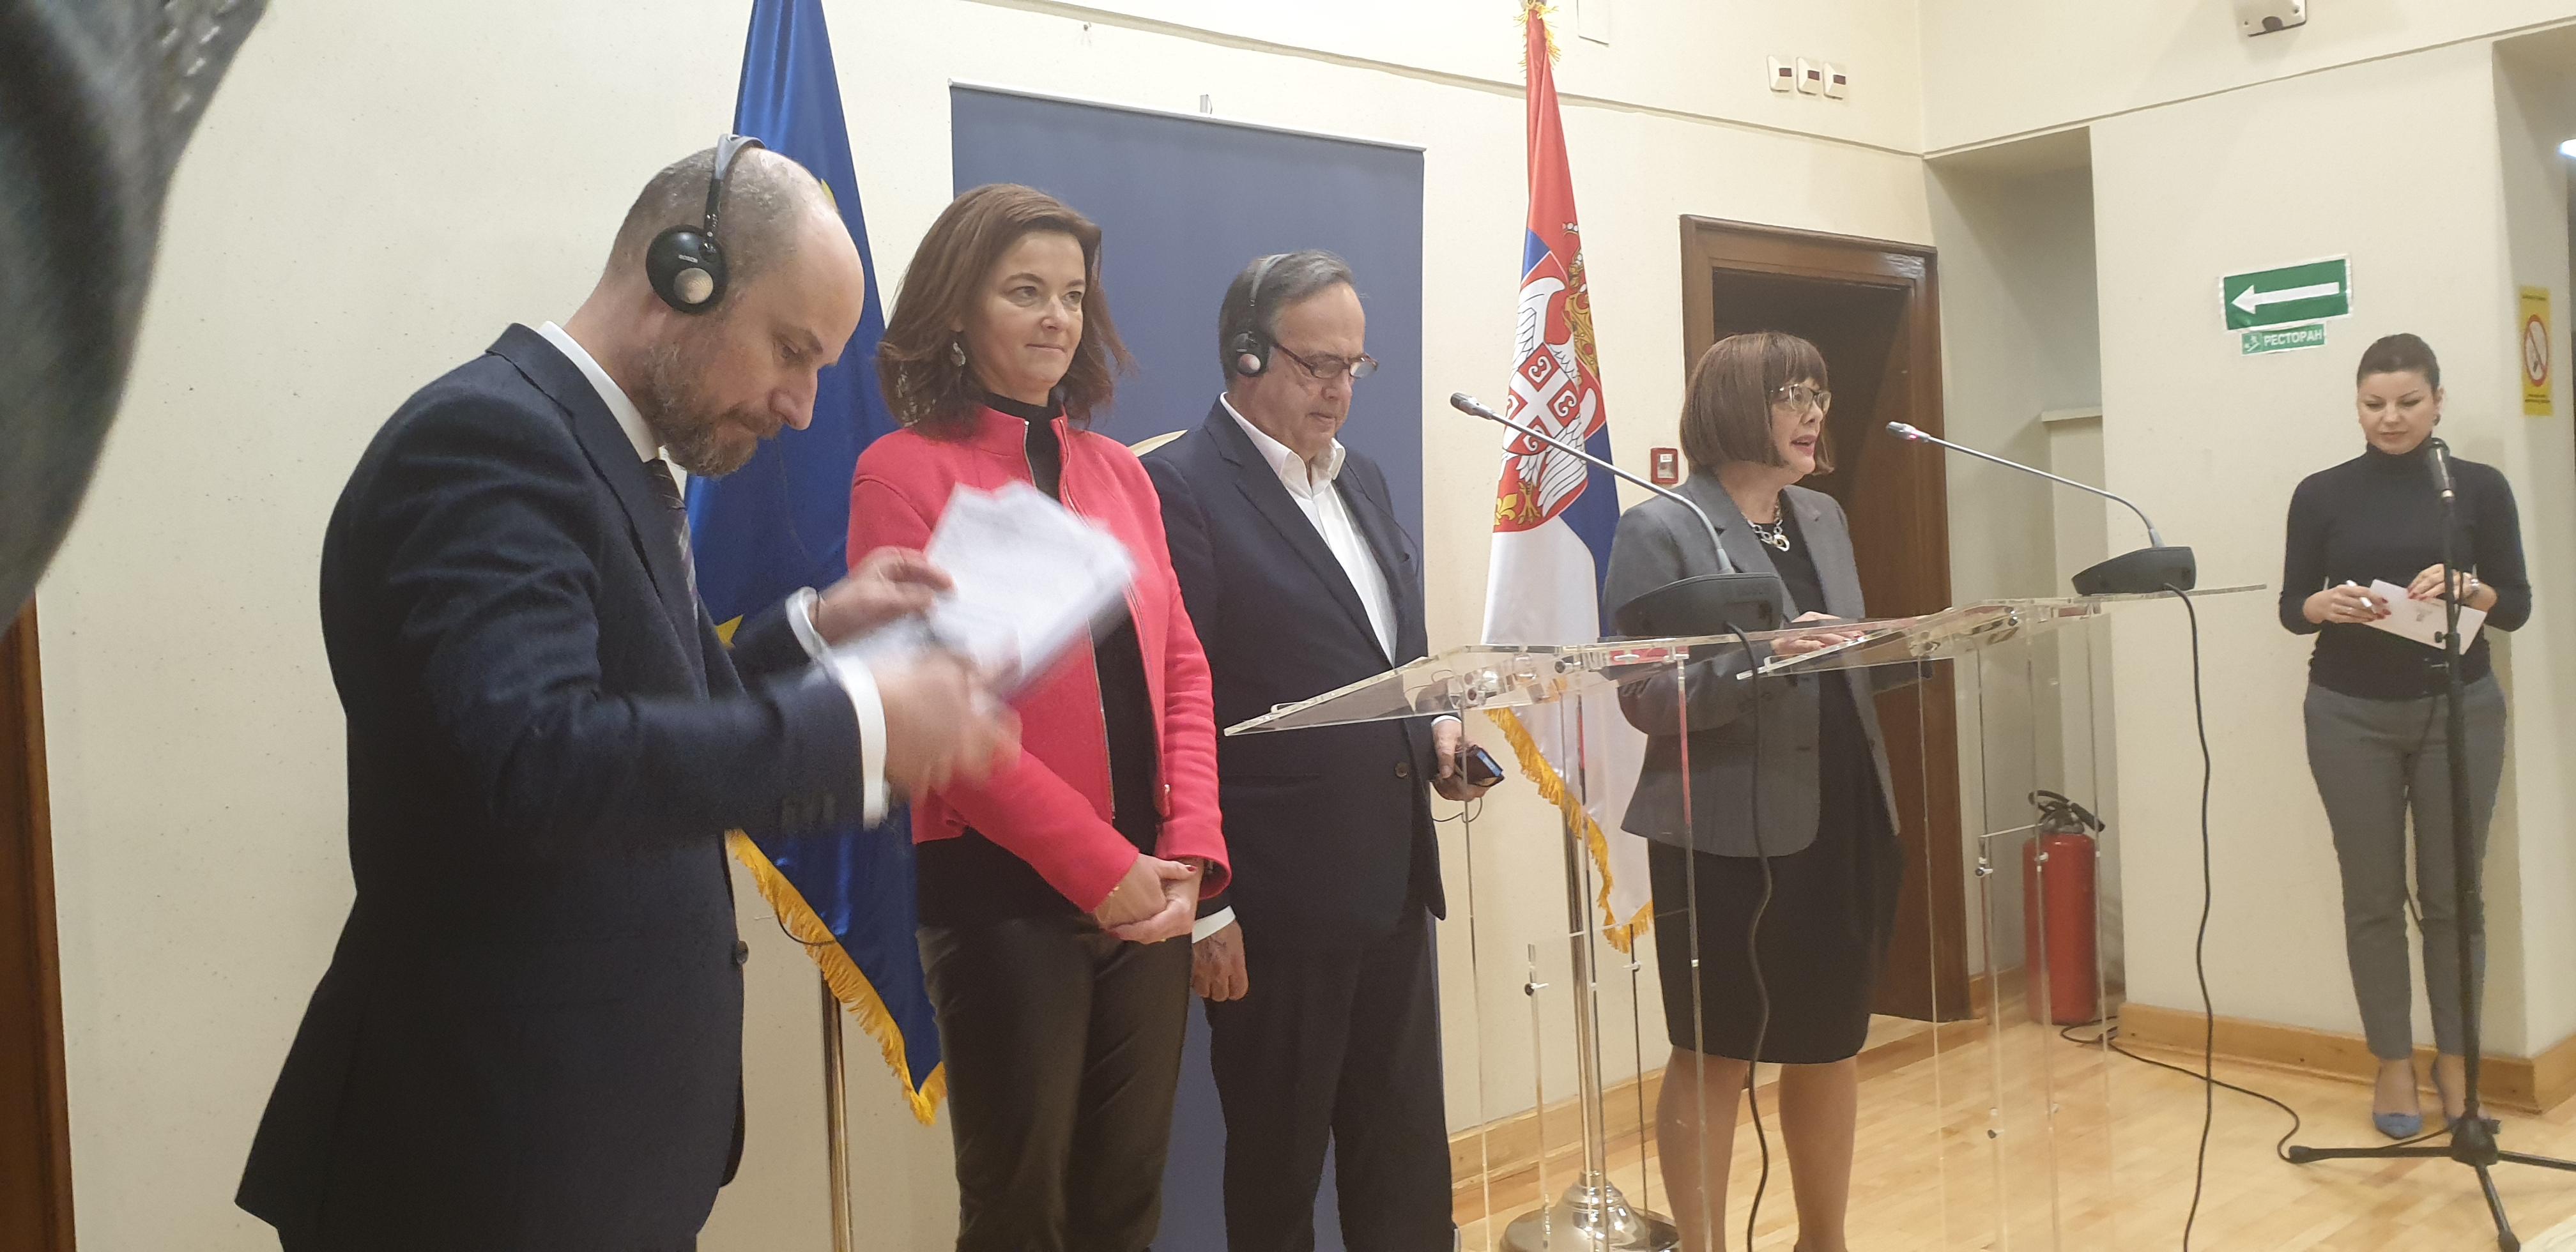 Vladimir Bilcik, Tanja Fajon, Knut Fleckenstein and Maja Gojcic at press conference